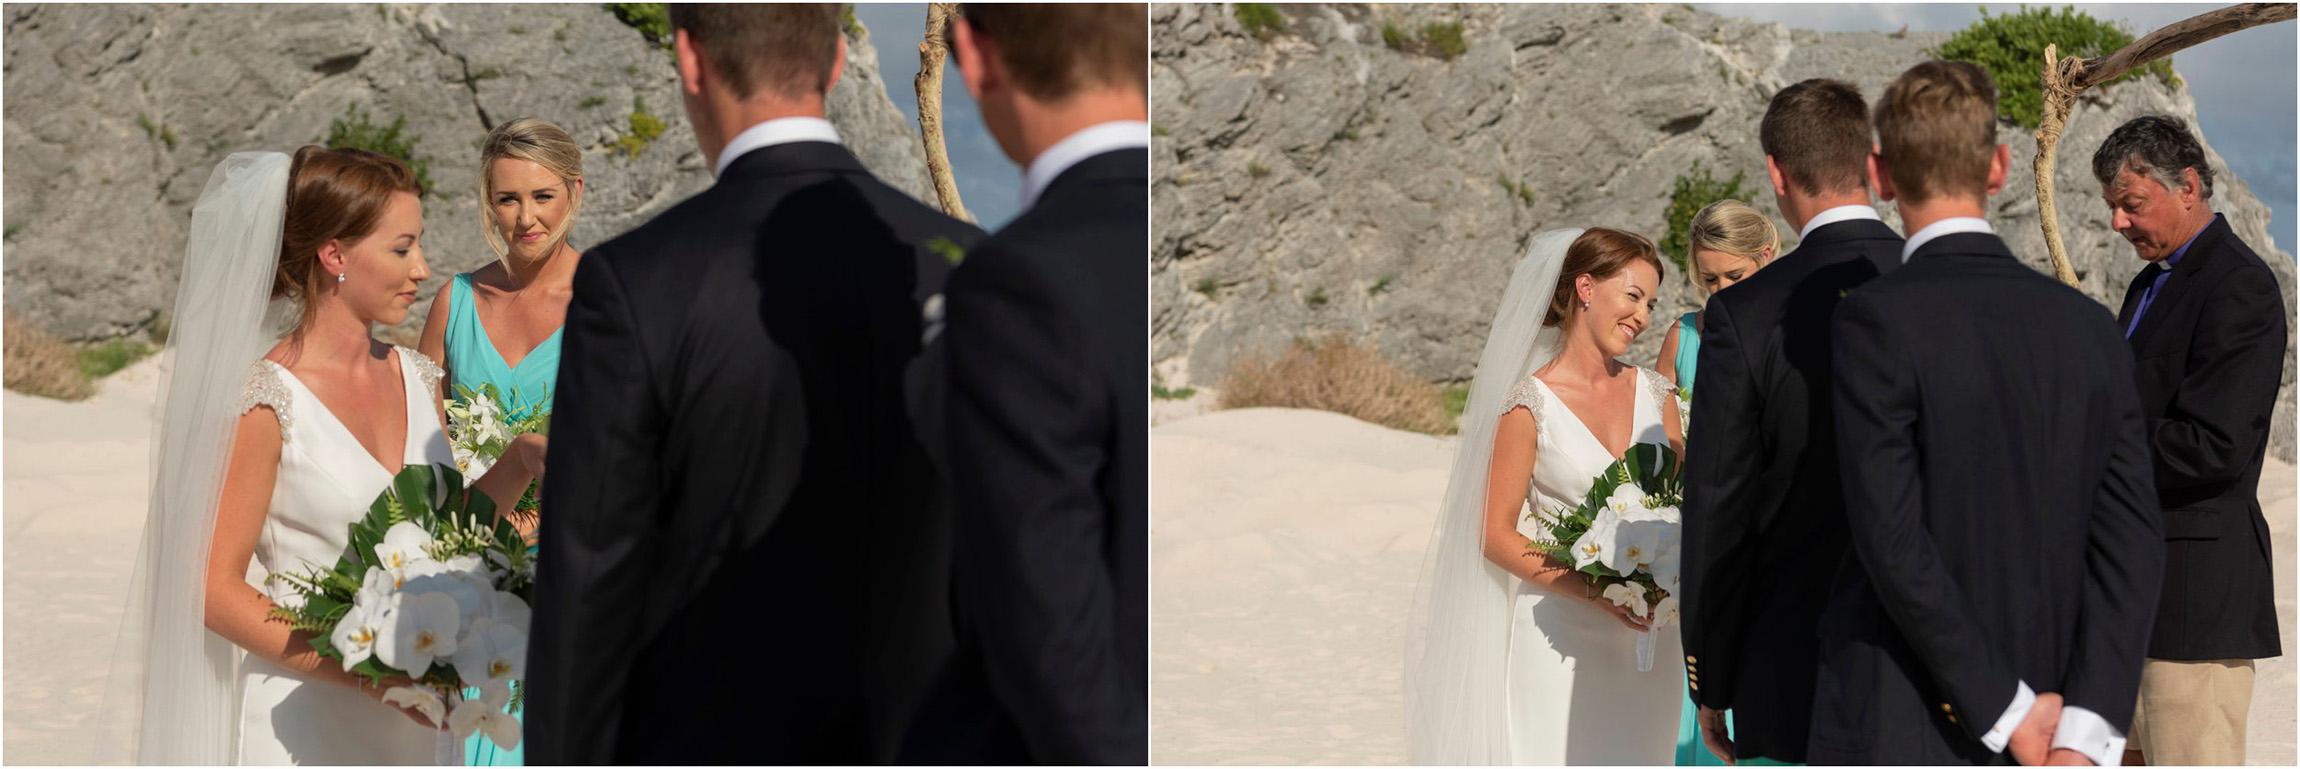 ©FianderFoto_Bermuda Wedding Photographer_Mid Ocean_Rachel_Angus_028.jpg